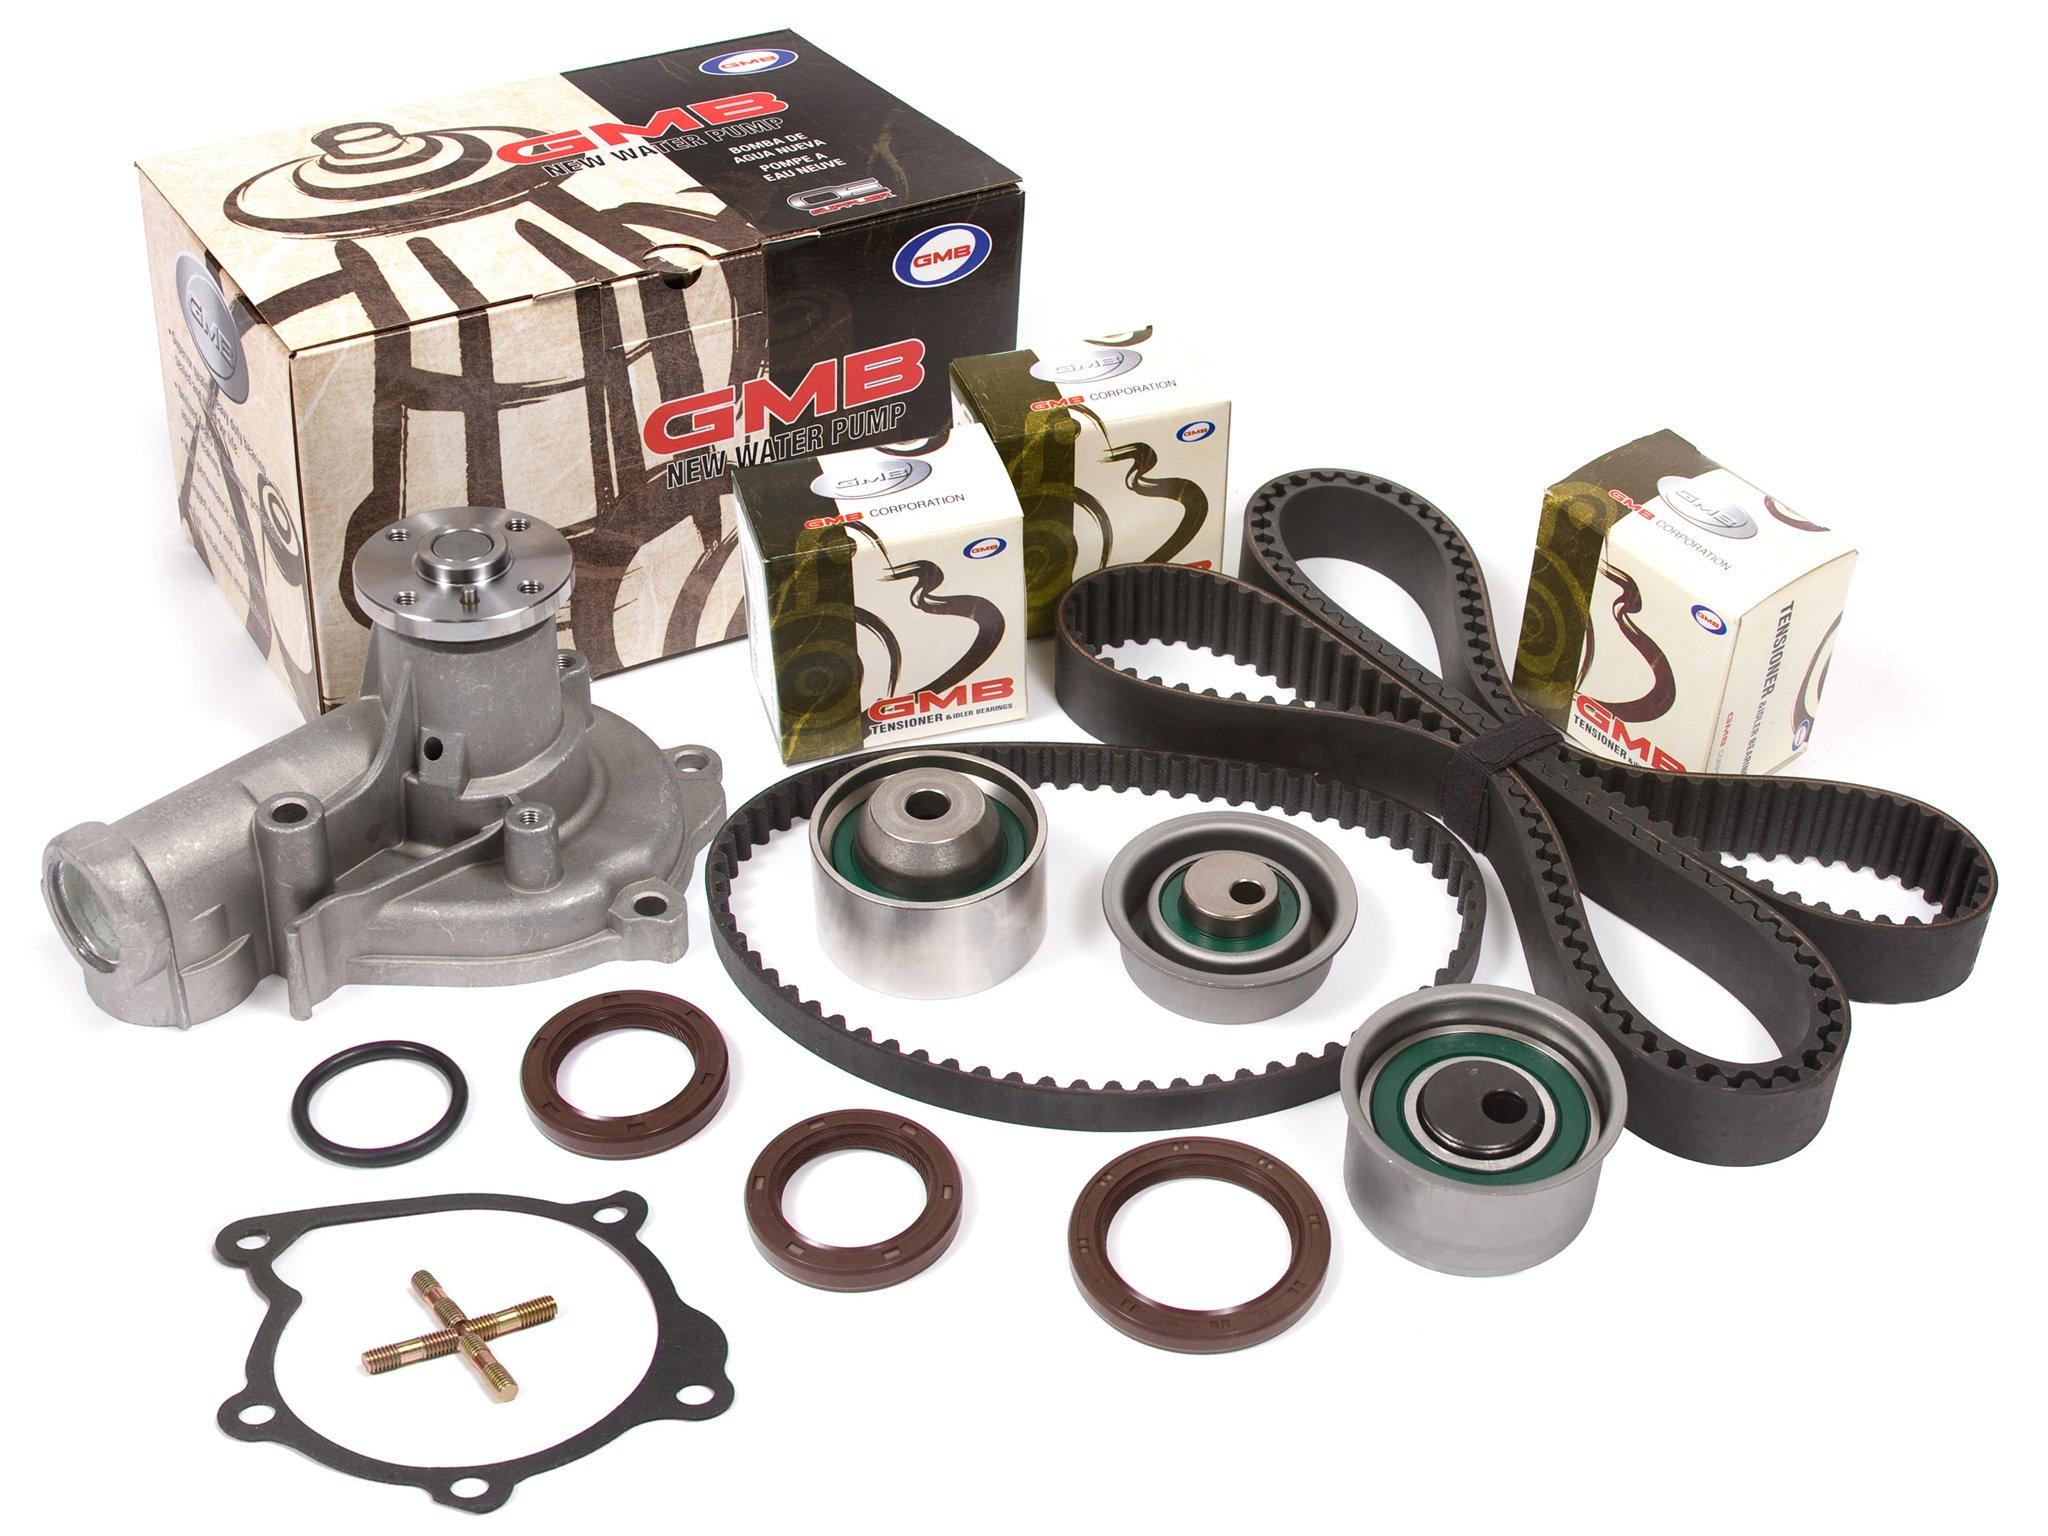 Evergreen TBK167VCT2 Fits 95-99 Mitsubishi Eclipse Eagle Talon Turbo 2.0 4G63T Timing Belt Kit Valve Cover Gasket Water Pump